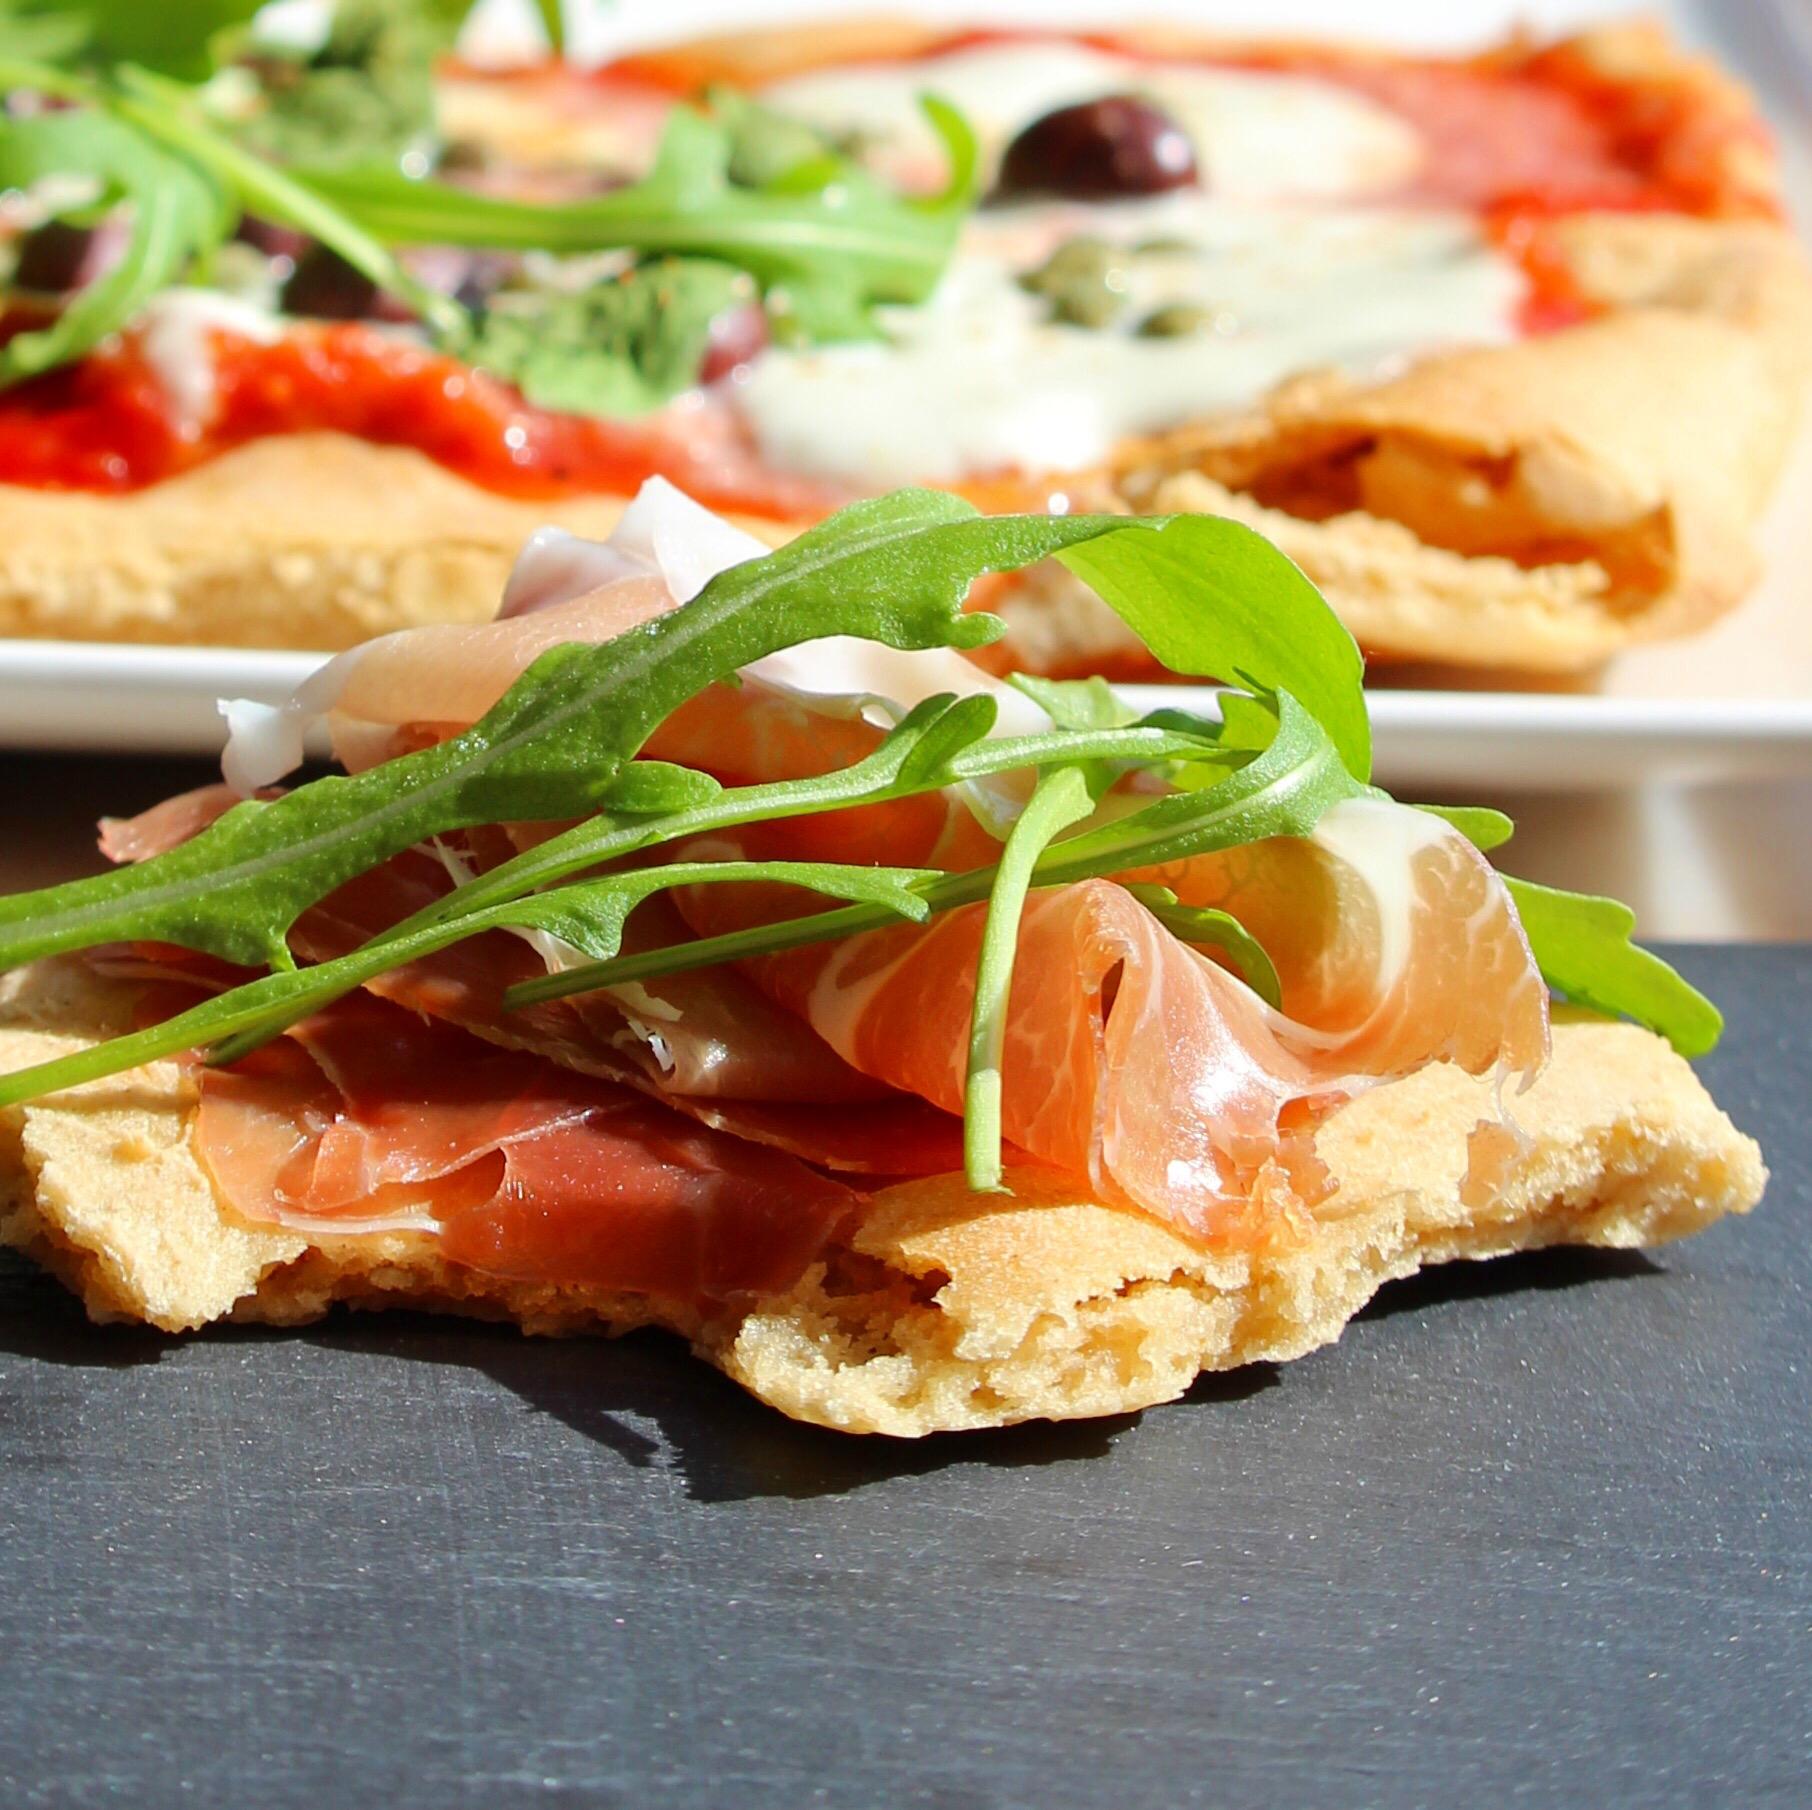 Gluten-Free Pizza Crust or Flatbread Buckwheat Queen